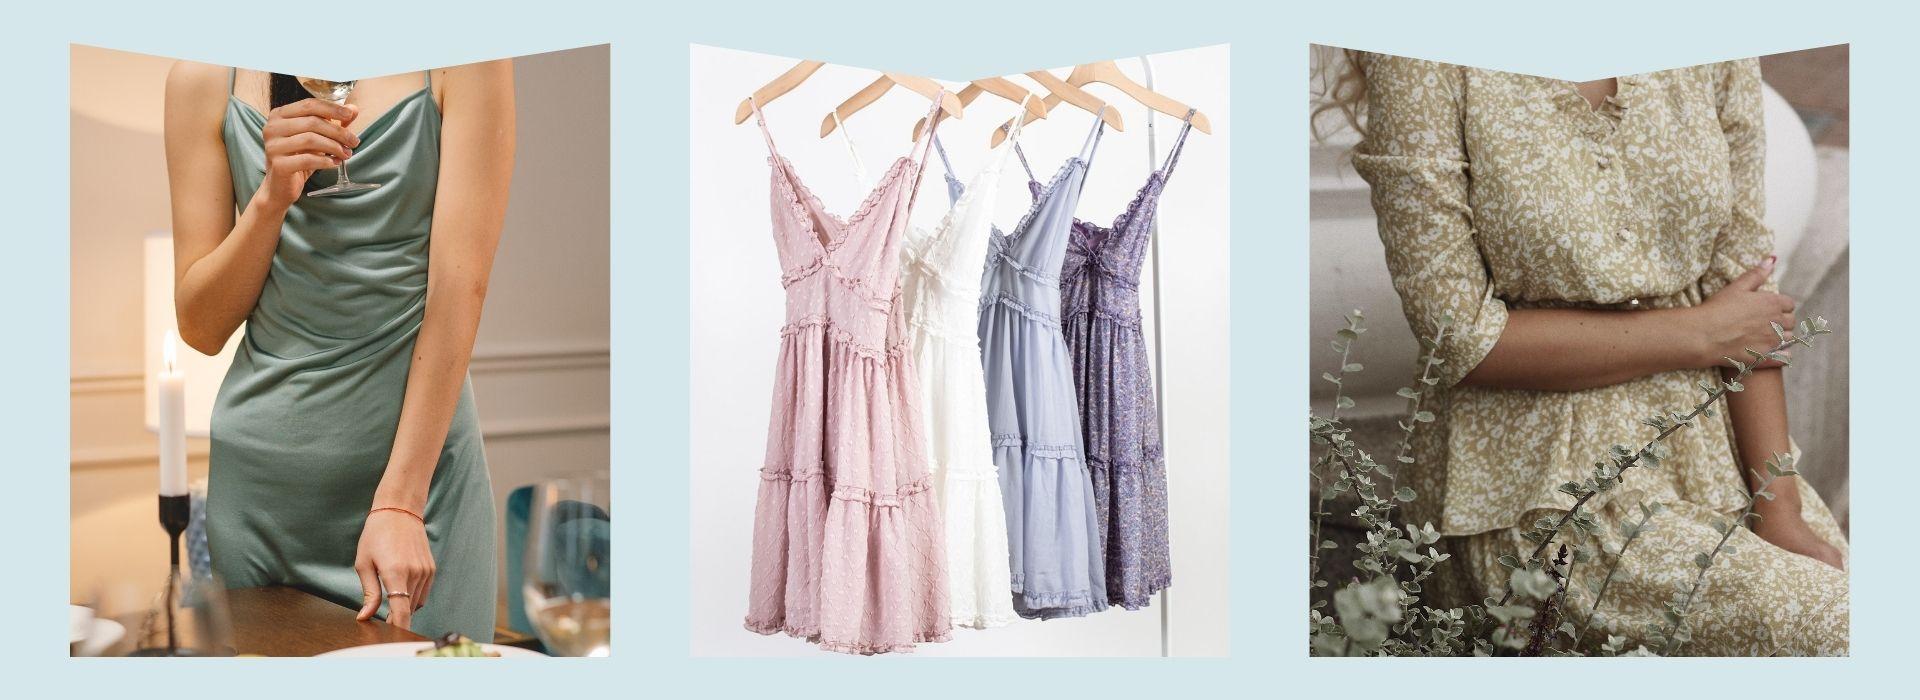 Silk dress, dresses hanging, sparkly dress